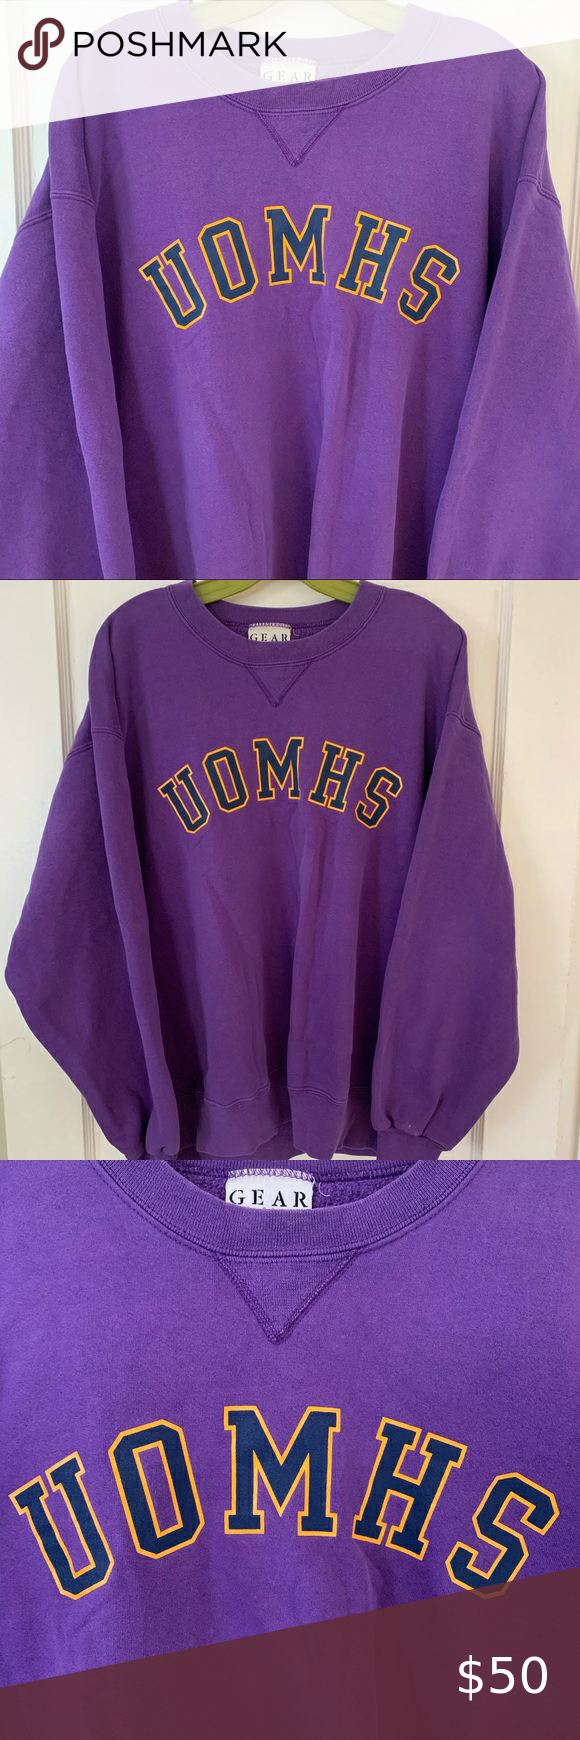 Vintage Uomhs Spellout Crewneck Sweatshirt Sz L Crew Neck Sweatshirt Sweatshirts Sweatshirt Shirt [ 1740 x 580 Pixel ]